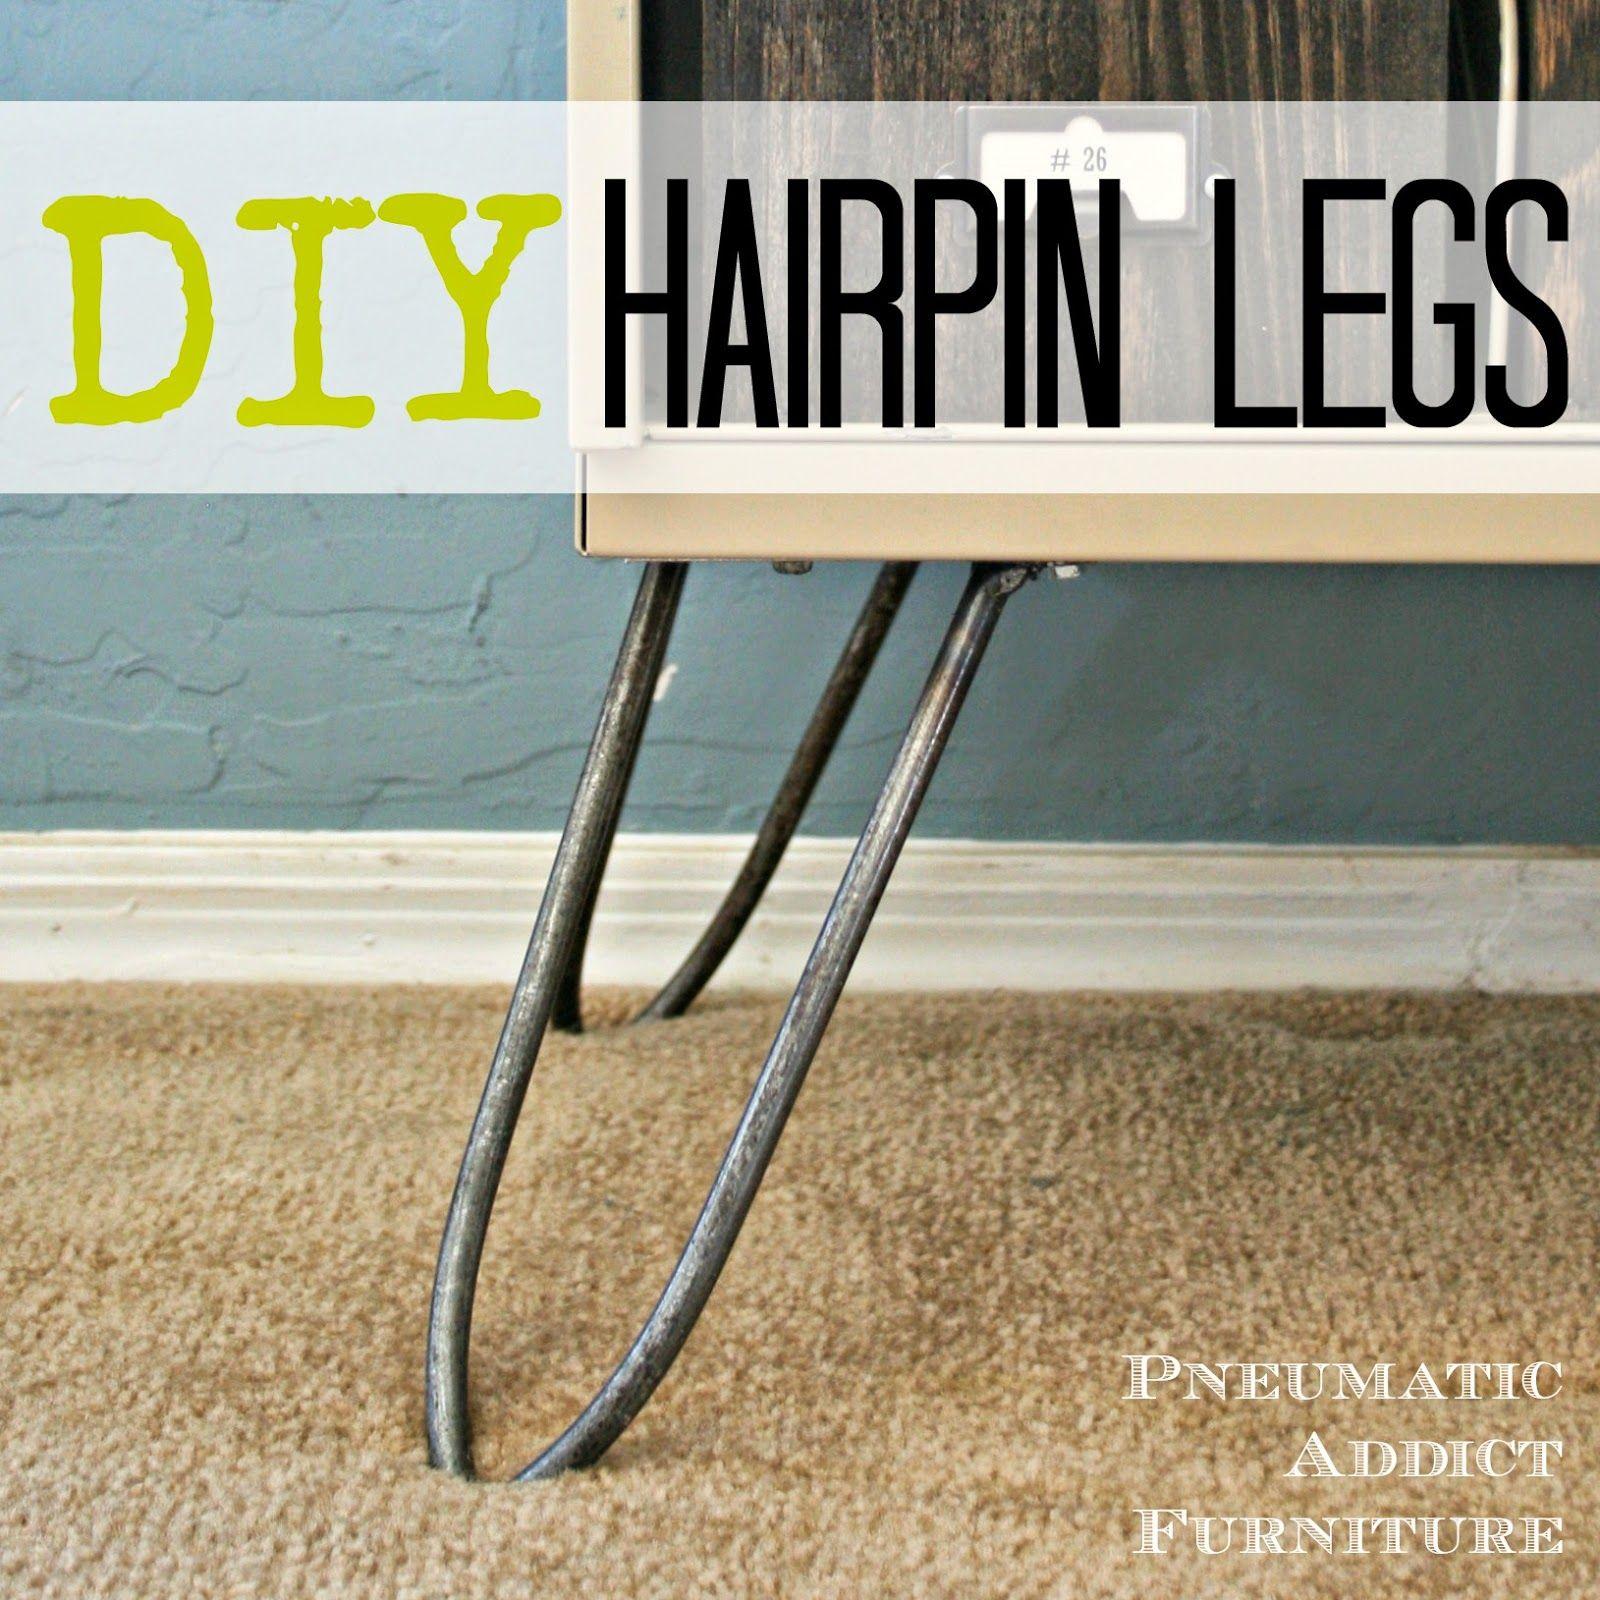 Furniture Legs Diy pneumatic addict furniture: diy hairpin legs super-cool lady with